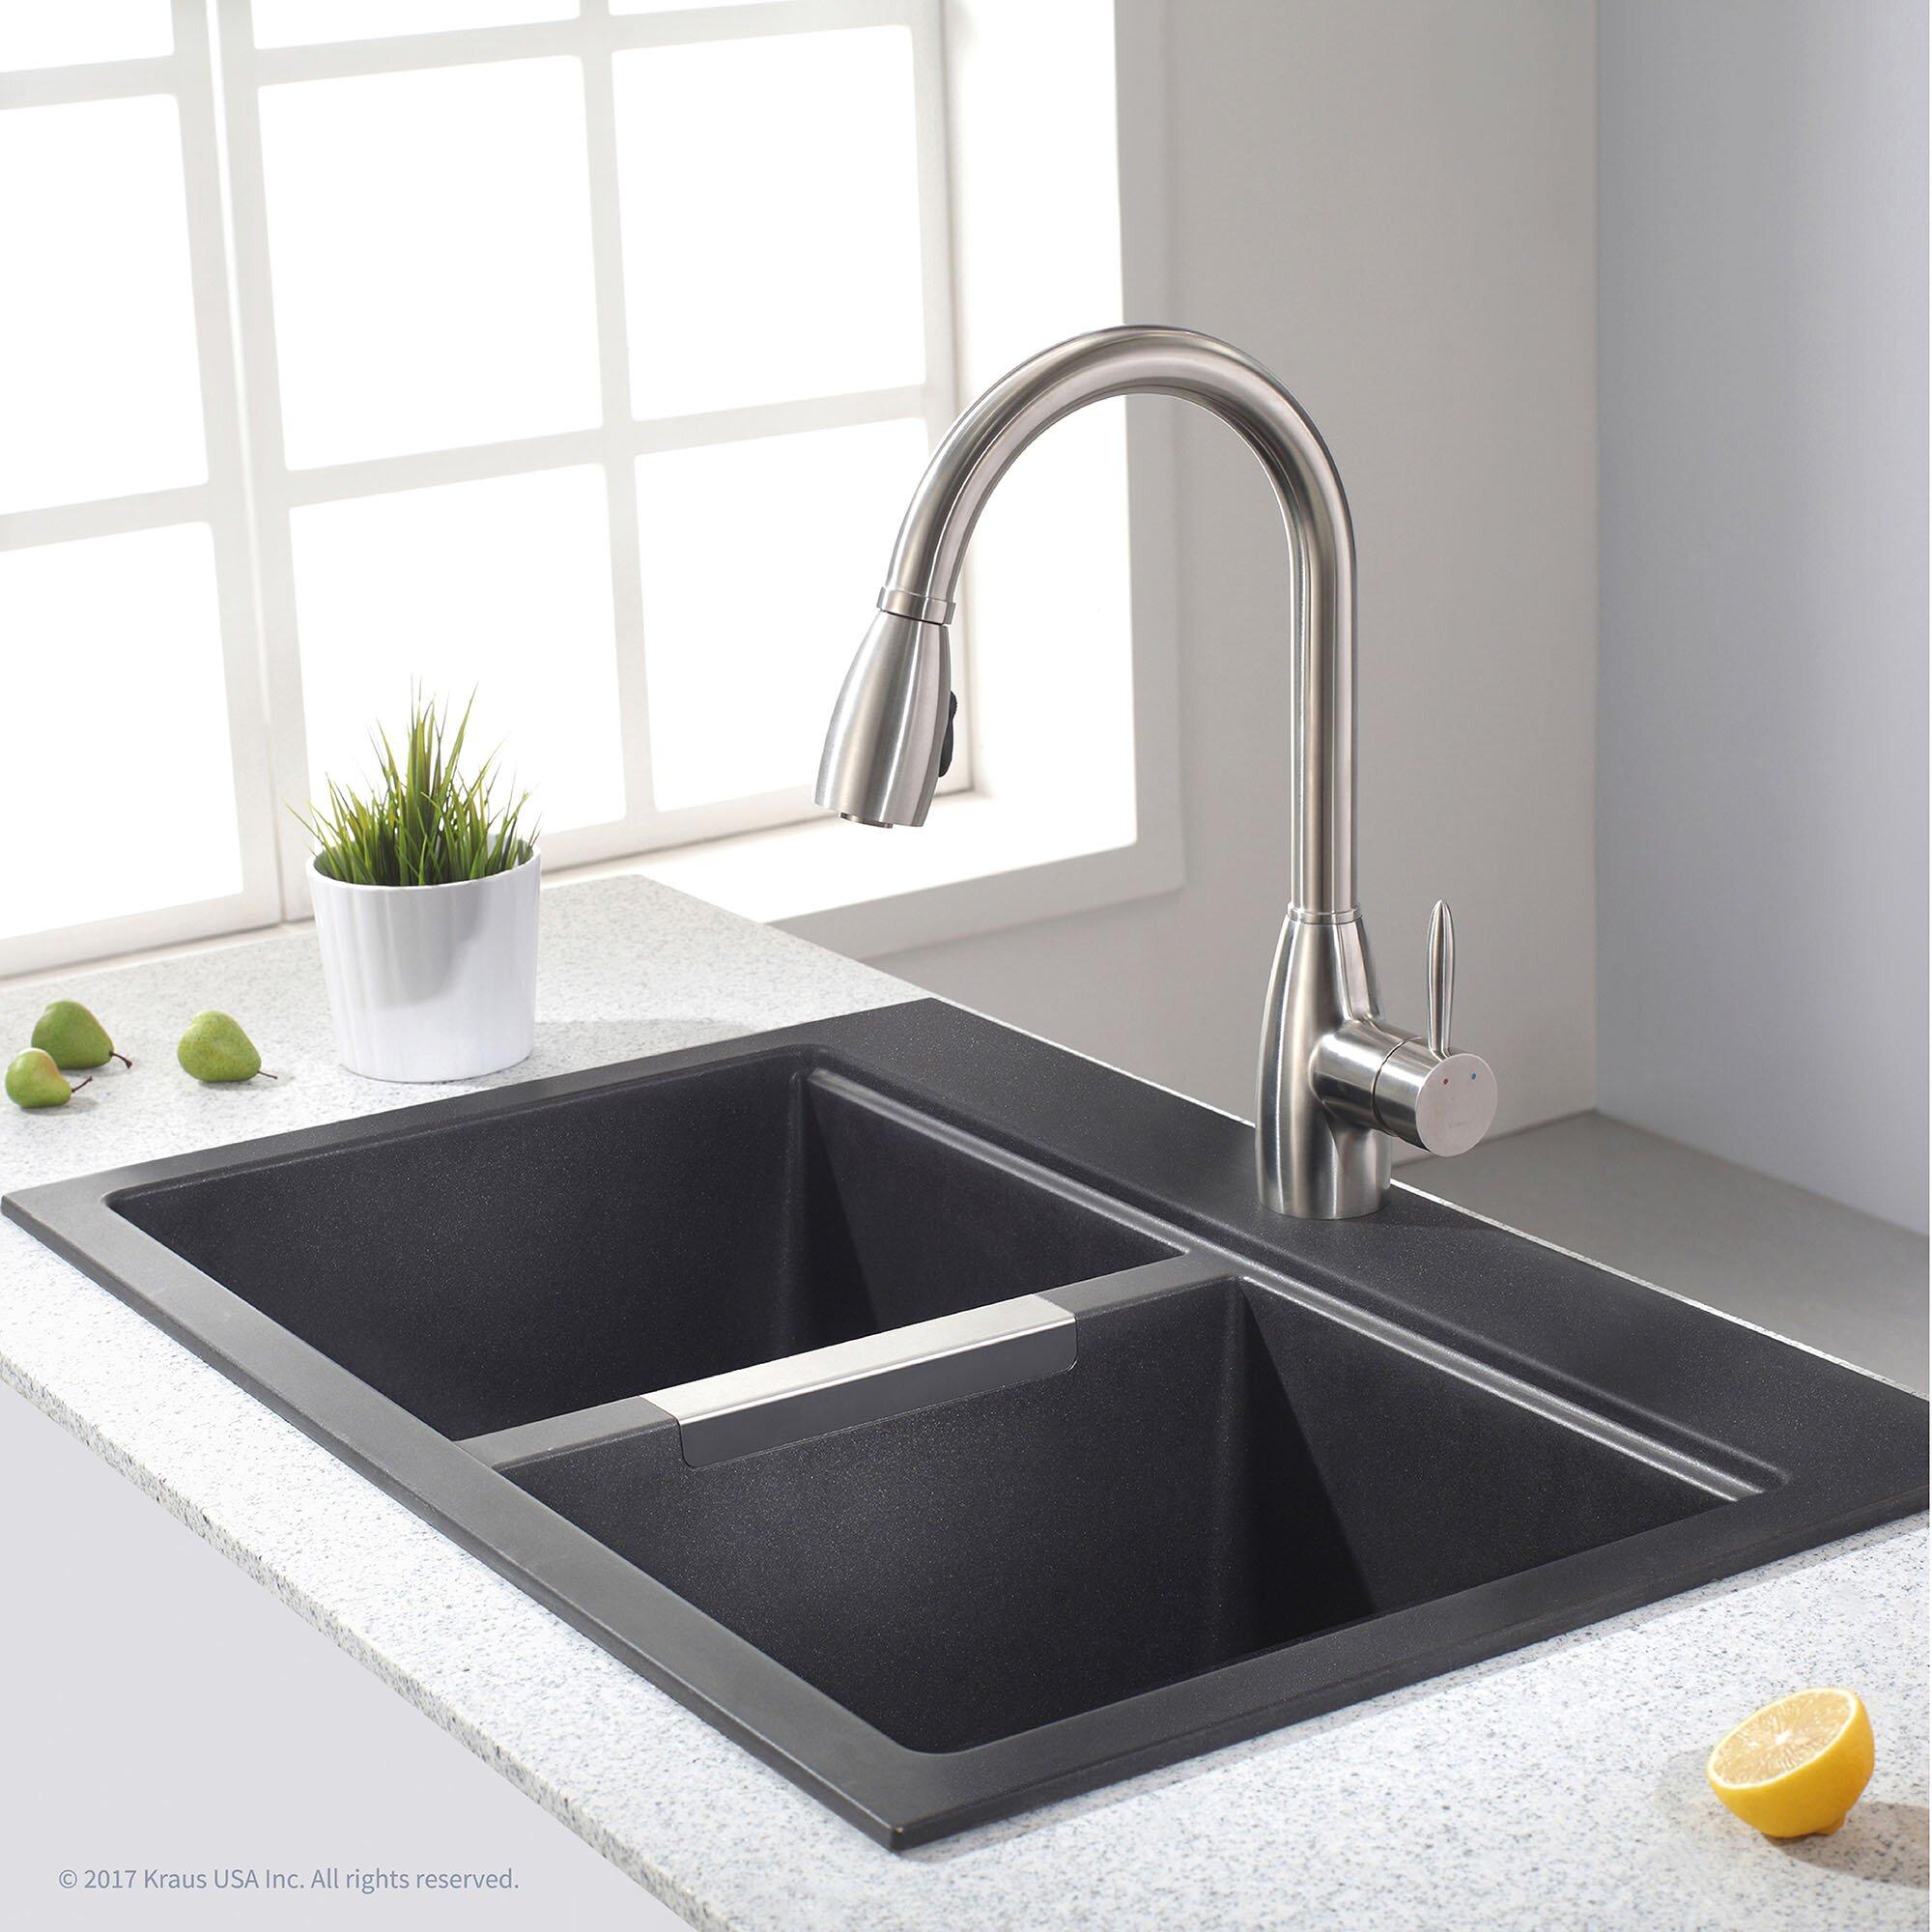 E granite sinks pros cons - Granite 33 5 X 22 Double Basin Undermount Kitchen Sink